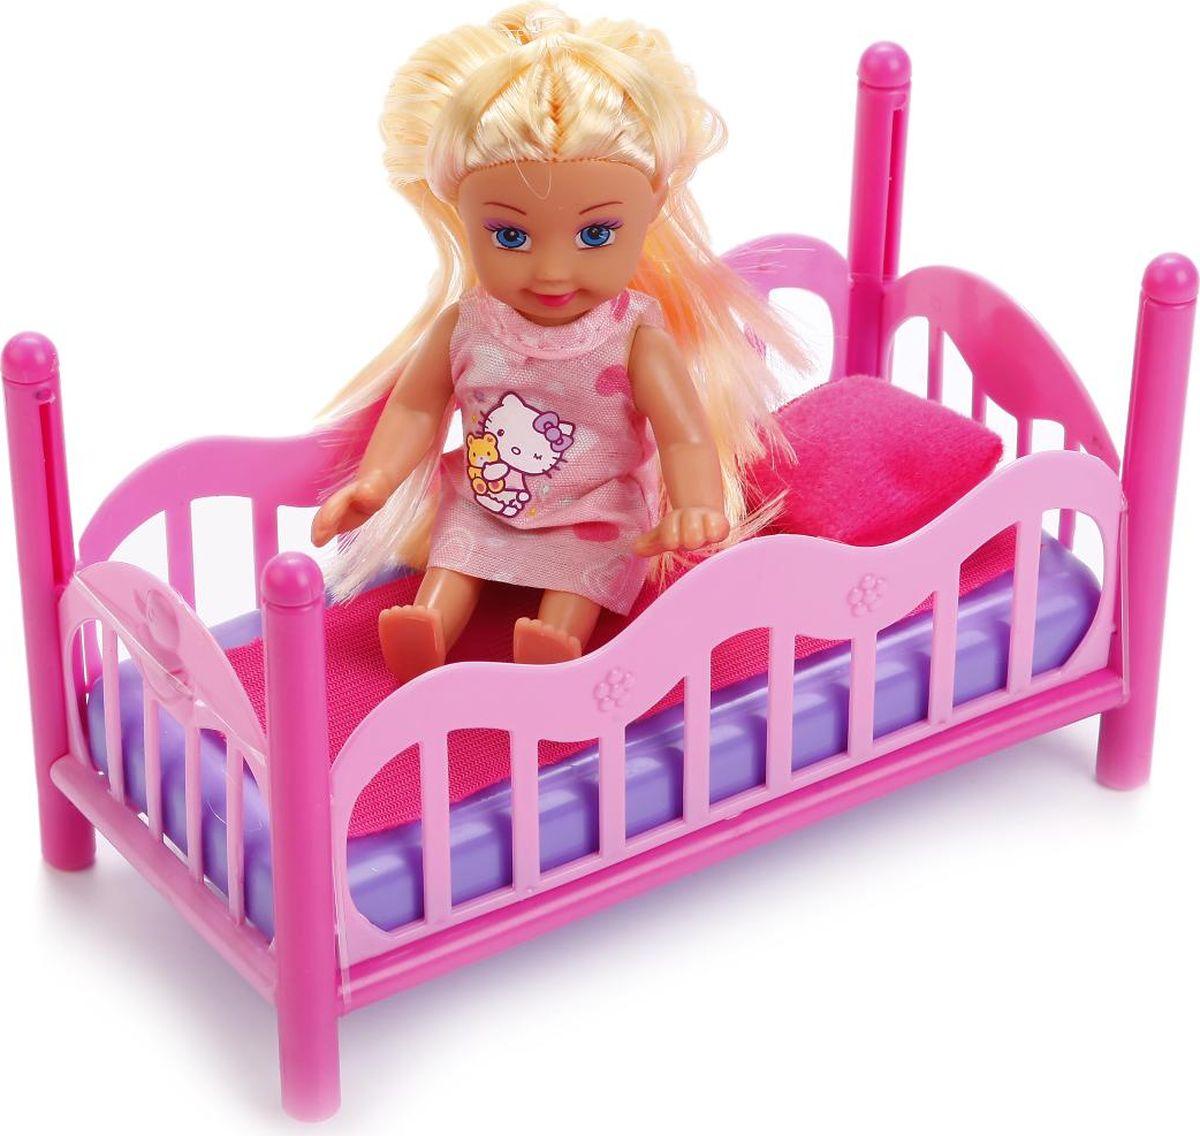 Карапуз Кукла Hello Kitty Машенька с кроваткой цвет розовый кукла машенька кукла книжка